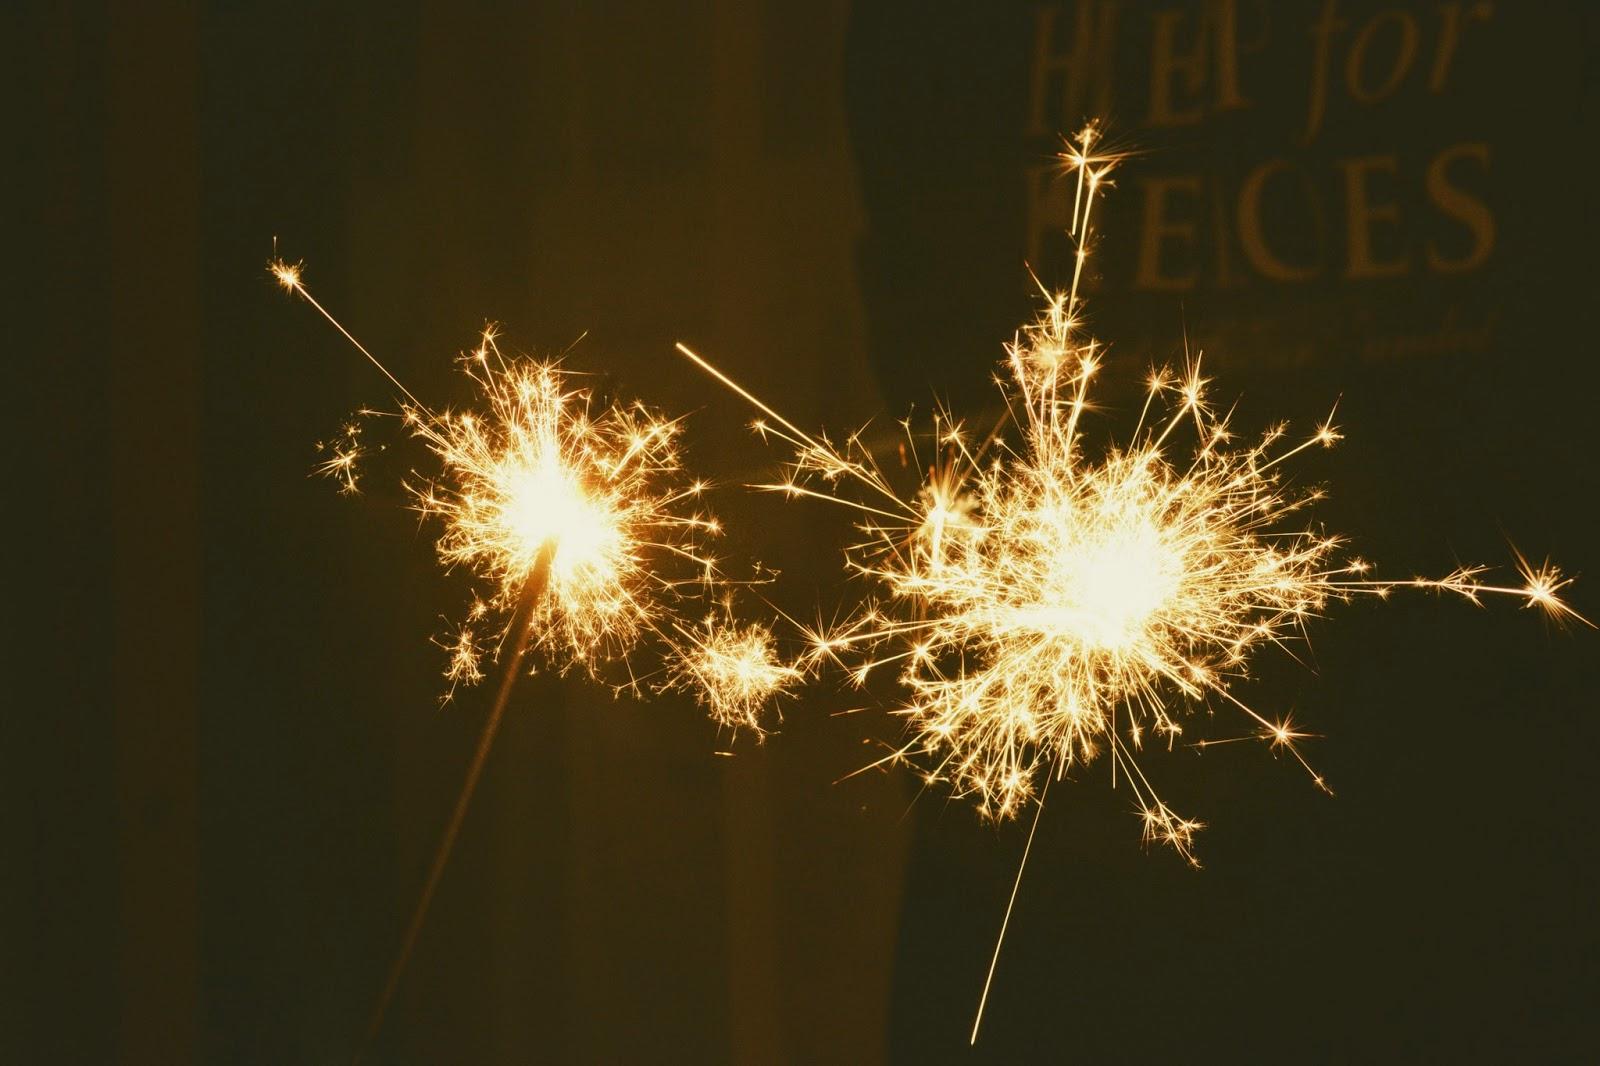 sparklers image, fall image, winter image, fireworks image